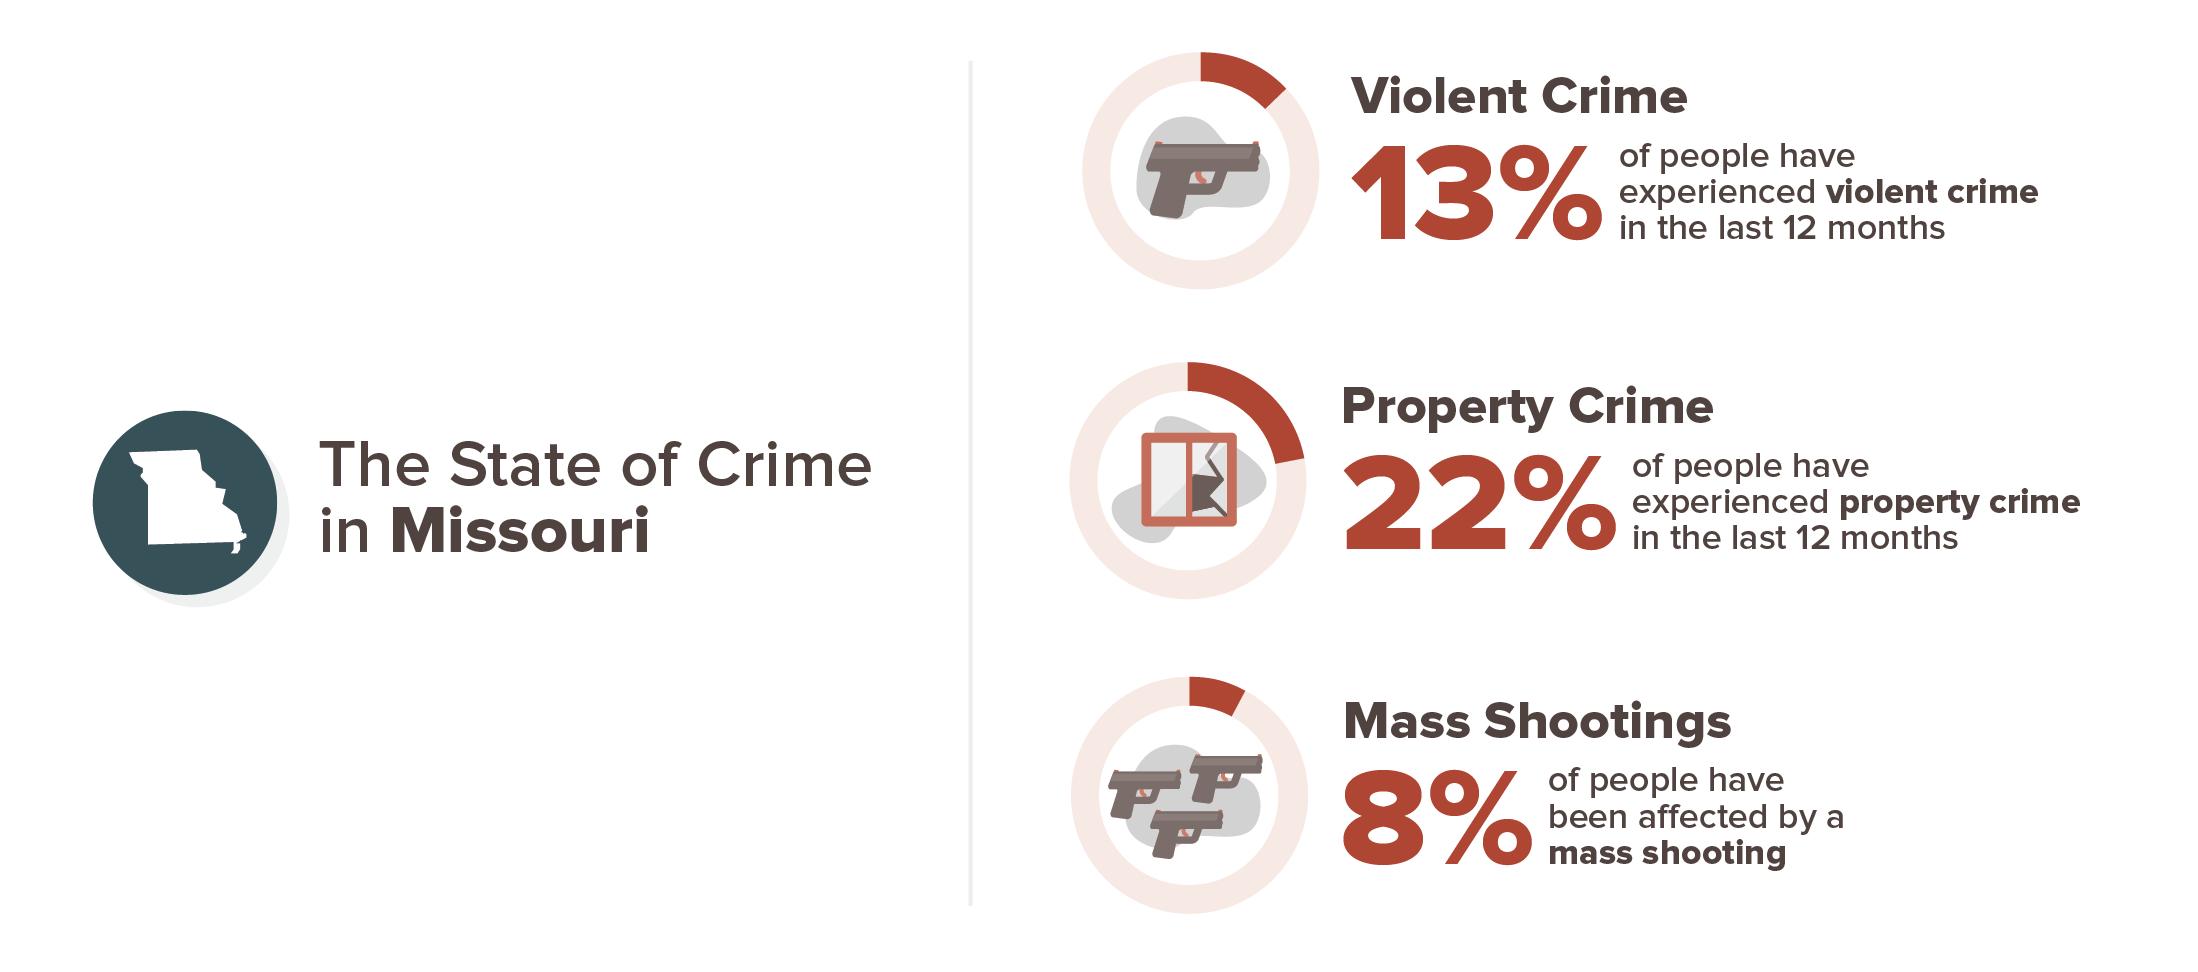 Missouri crime experience infographic; 13% violent crime, 22% property crime, 8% mass shooting